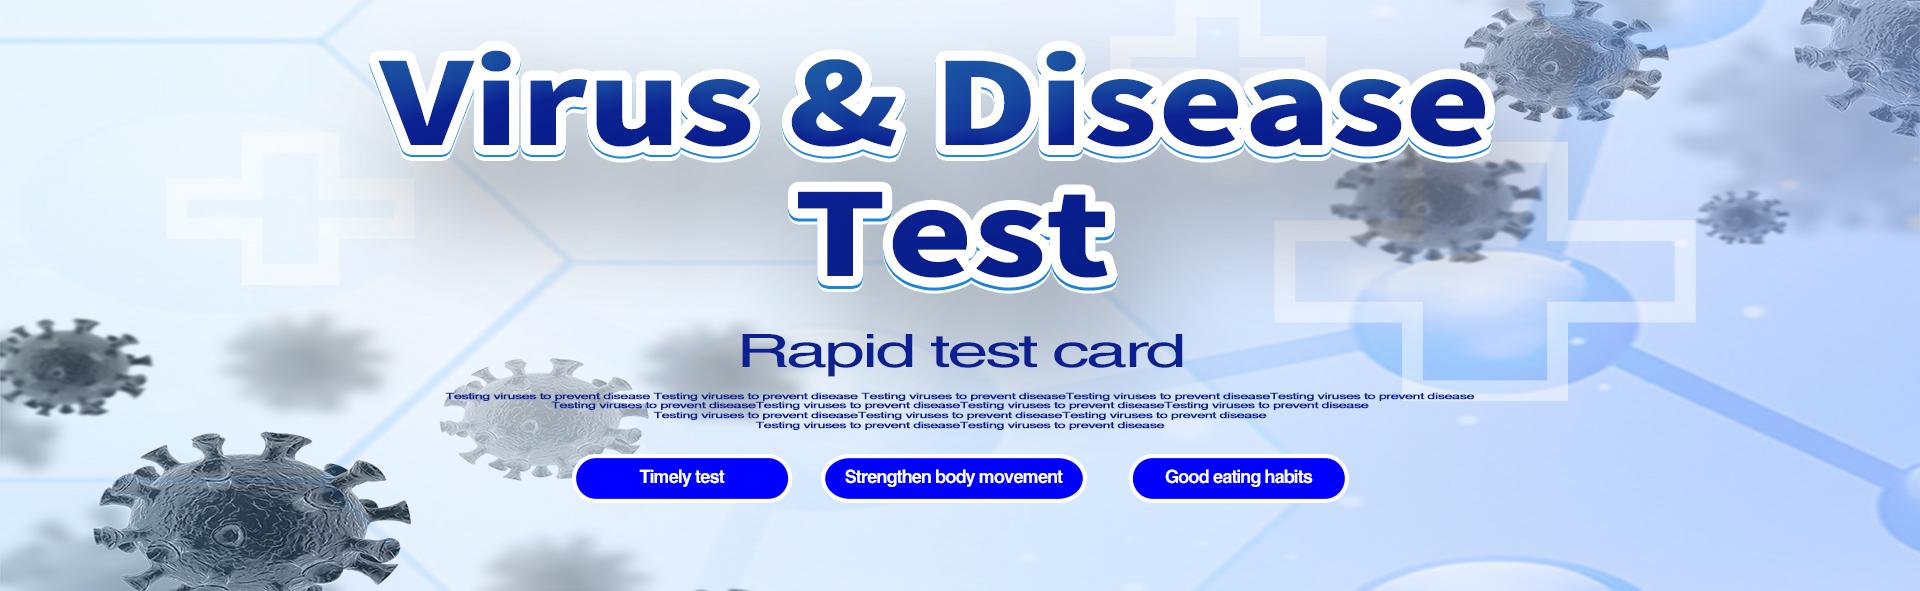 Virus & Disease Detection